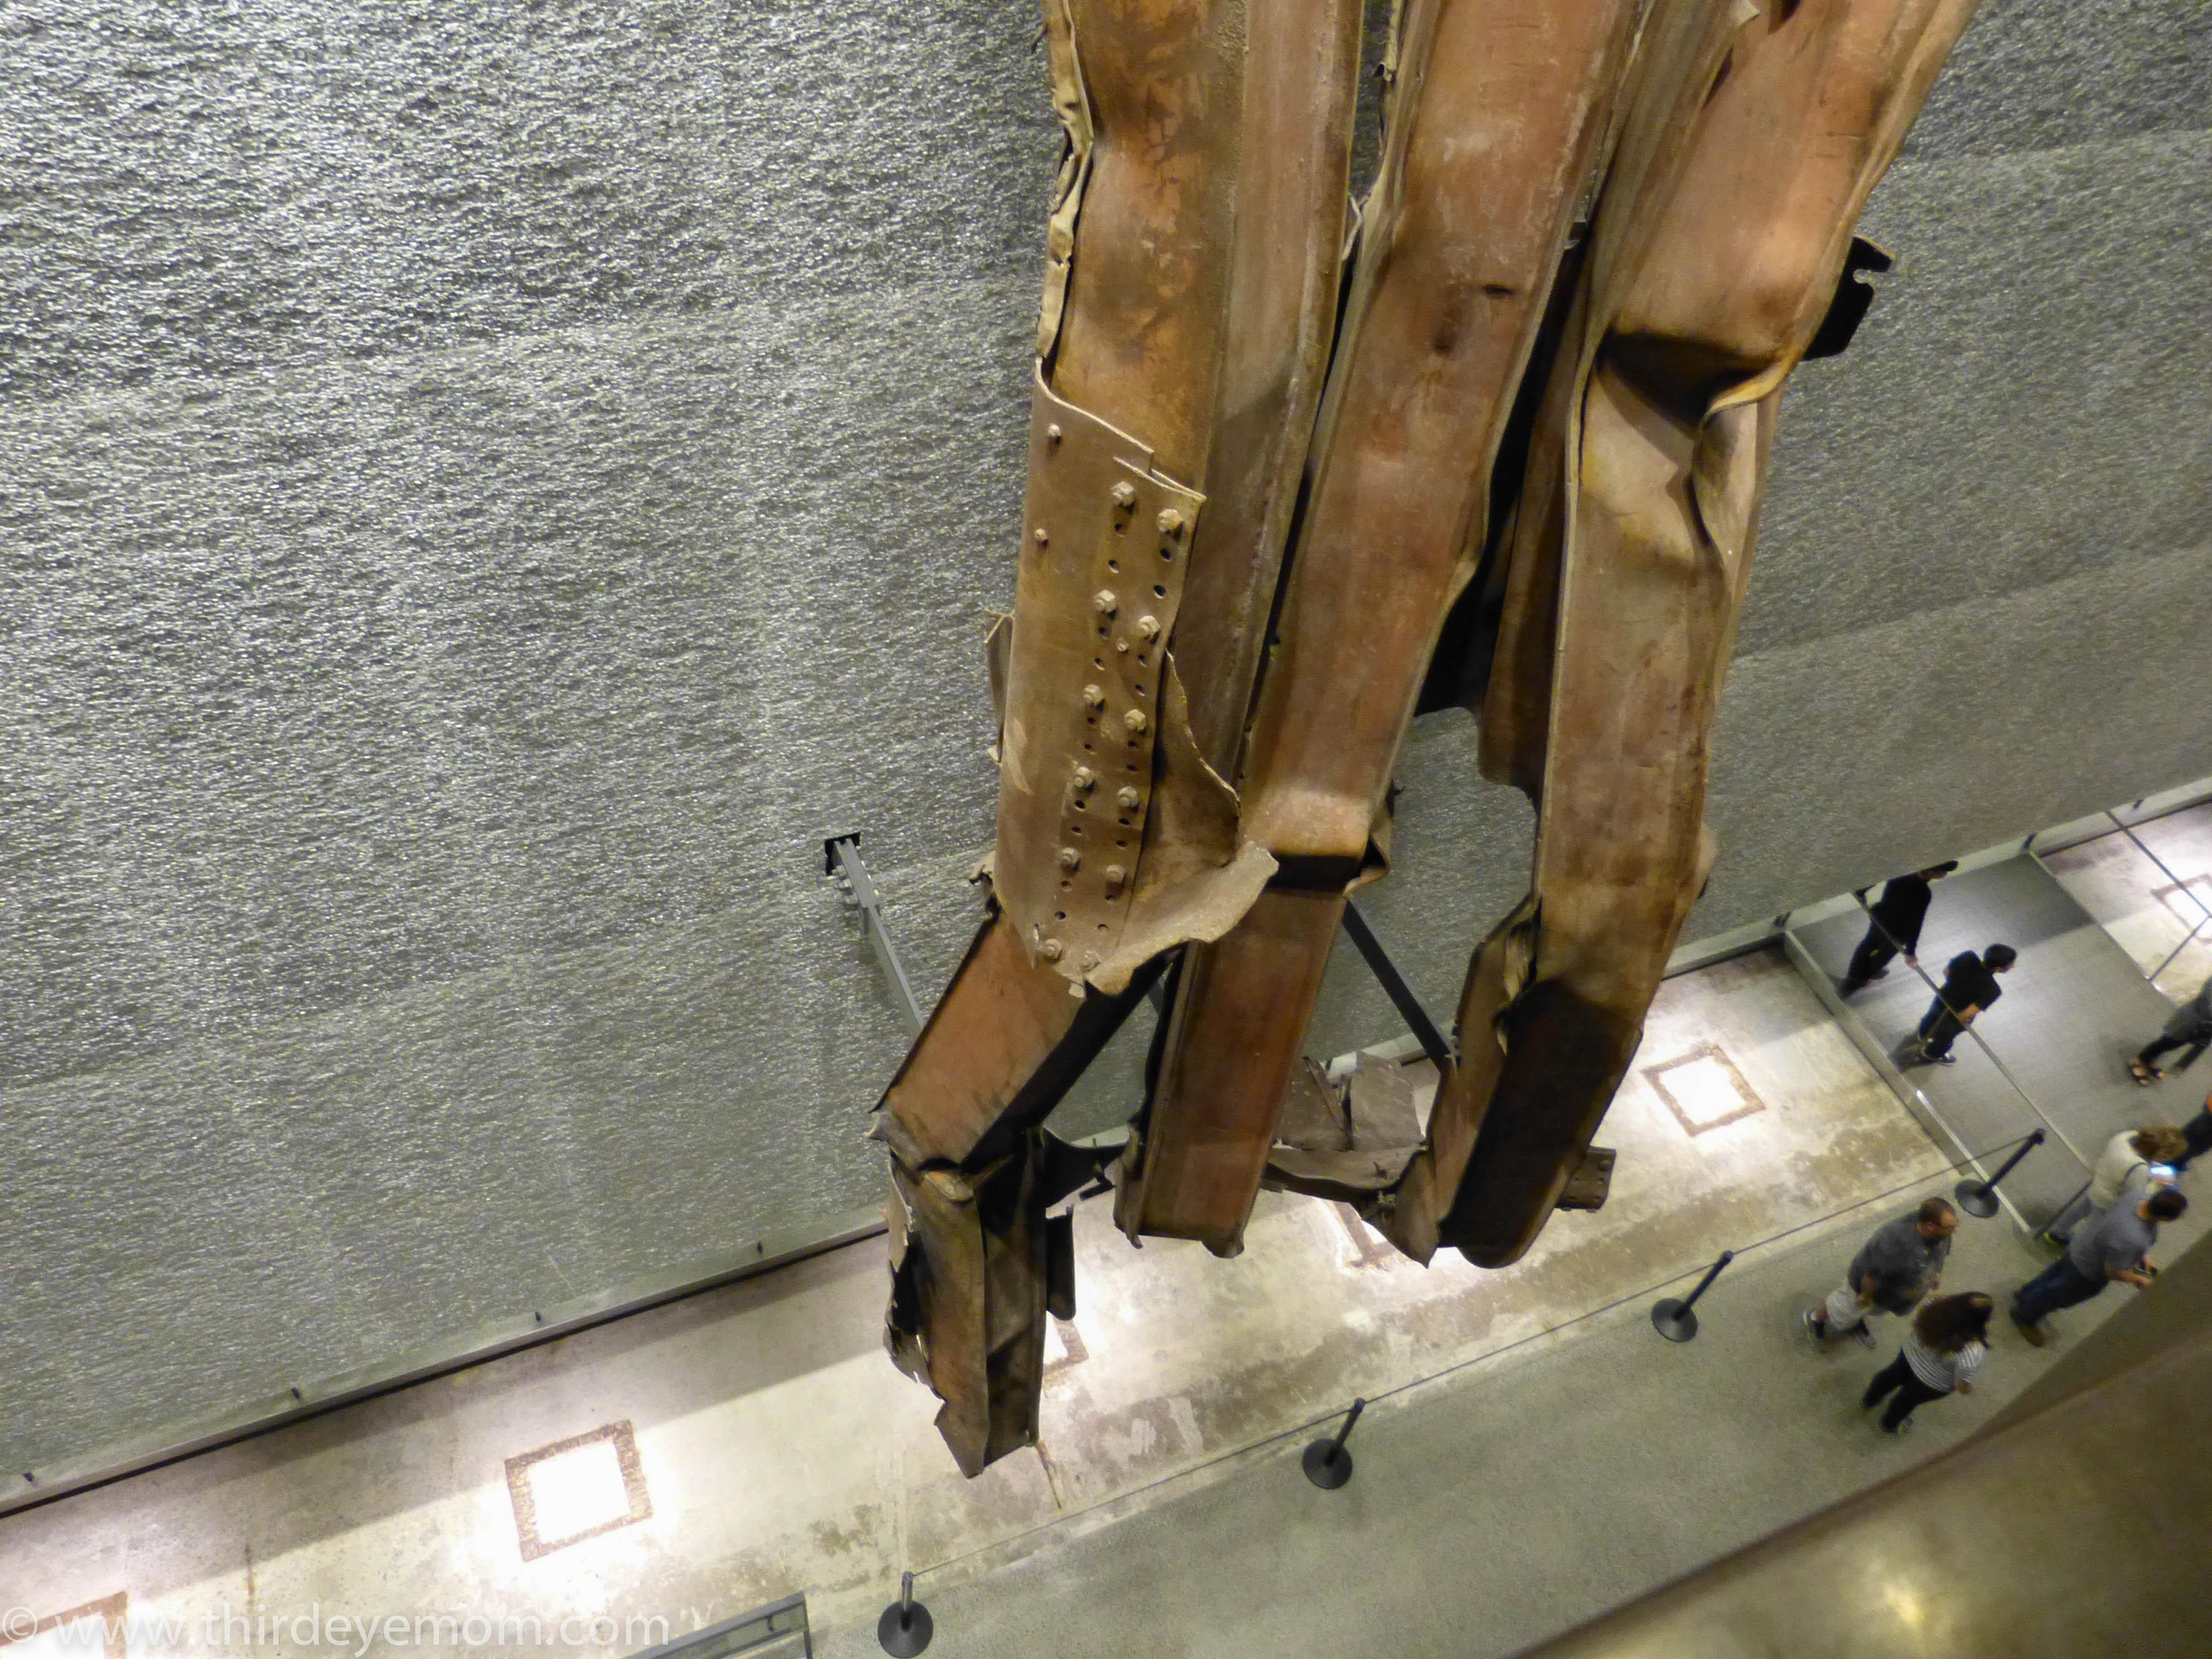 Memory Remains: 9/11 Artifacts at Hangar 17